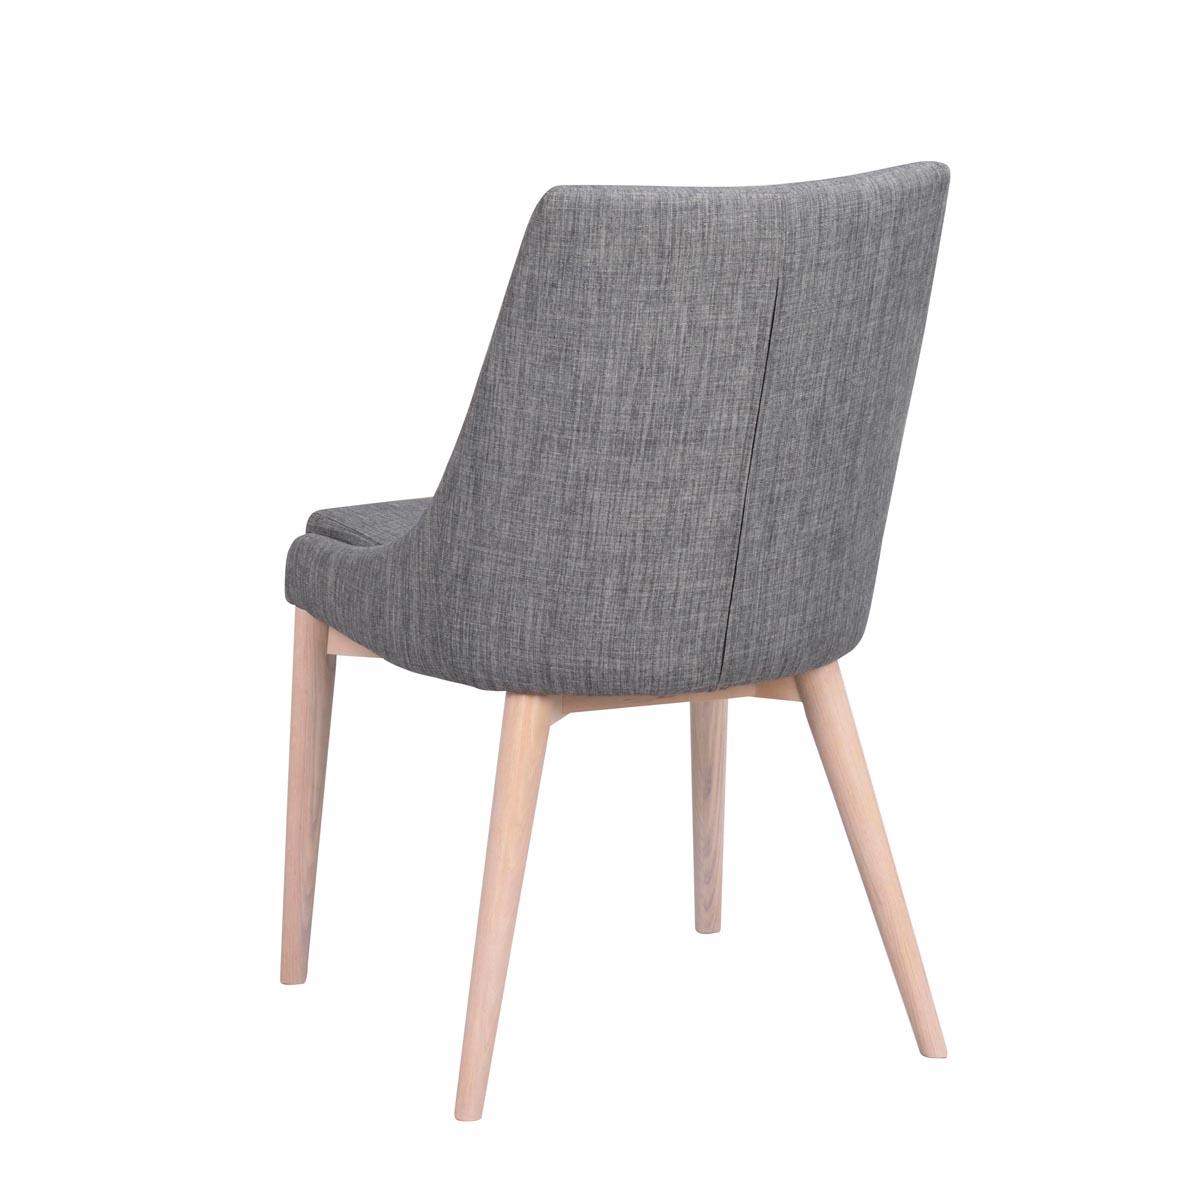 Bea-stol-mörkgrått-tyg_wwR-118322_d